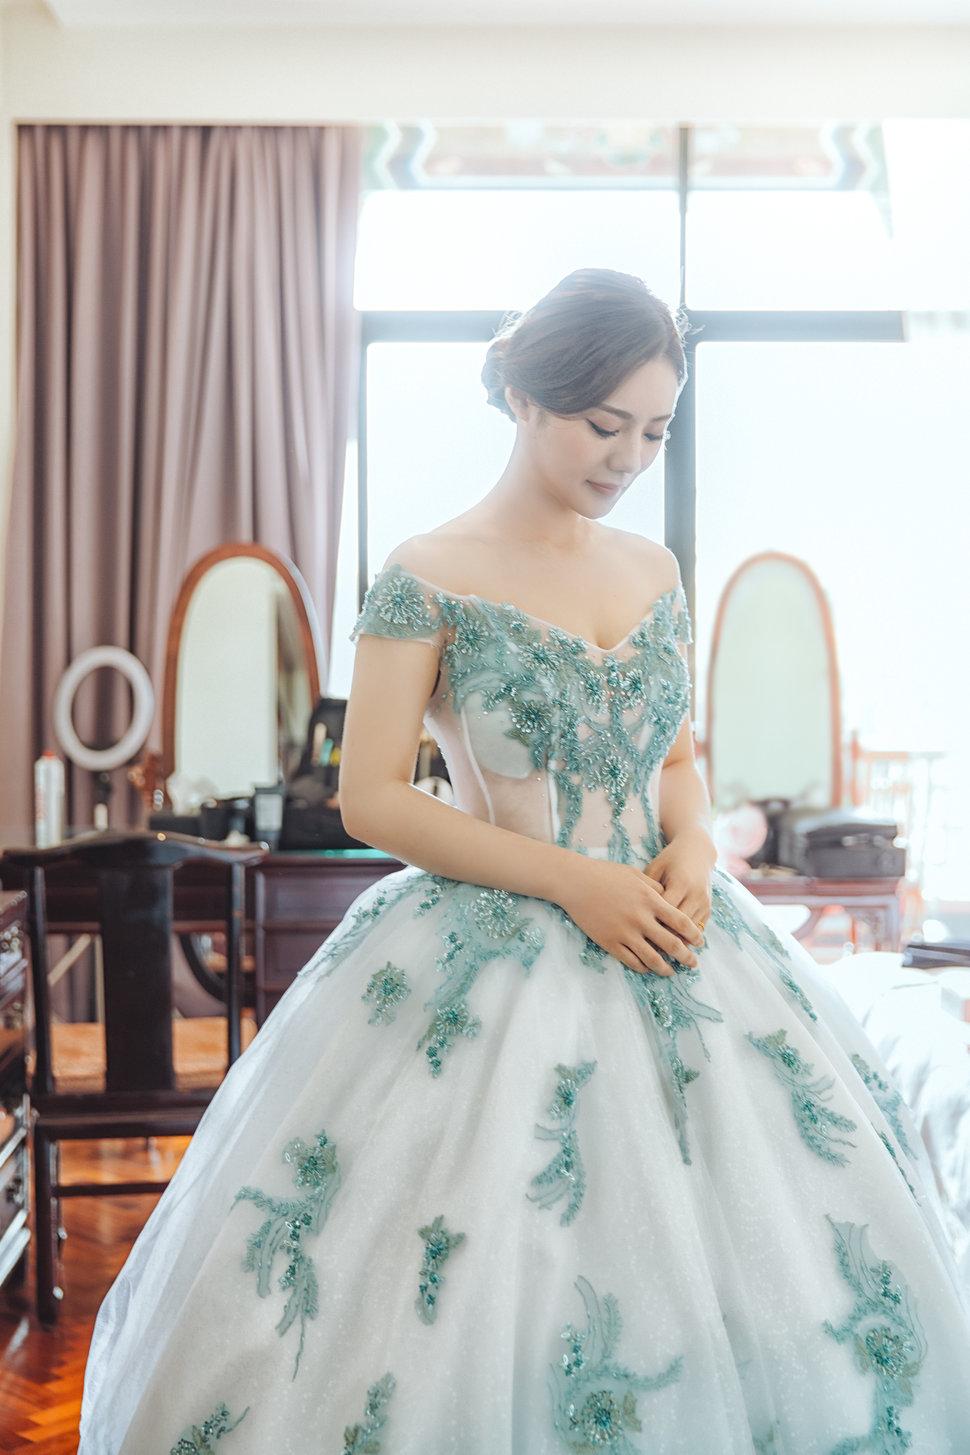 20190914-QUAN4230-編輯-編輯-編輯 - QUAN  婚禮紀錄 / 影像工作室《結婚吧》